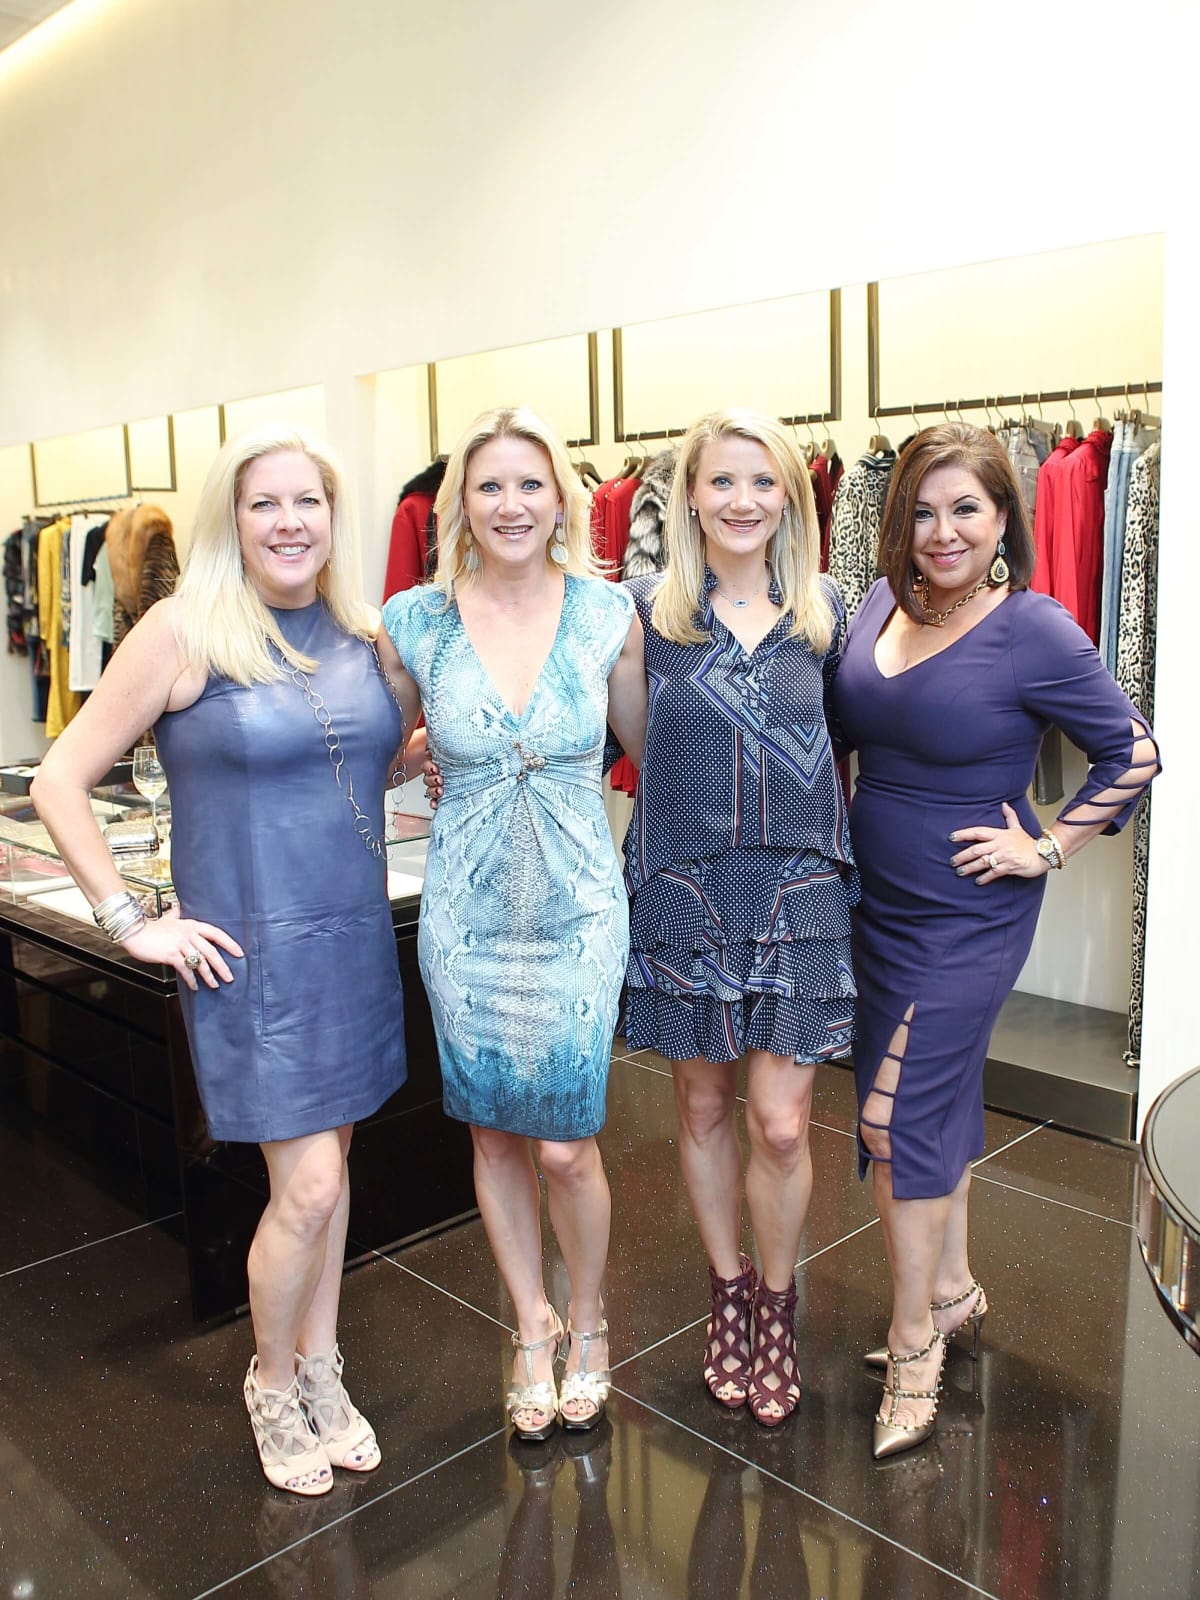 Kara Kinder Vidal, Stacey Soriero, Stephanie Cockrell, Debbie Festari at Cavalli kickoff luncheon for Una Notte de Italia